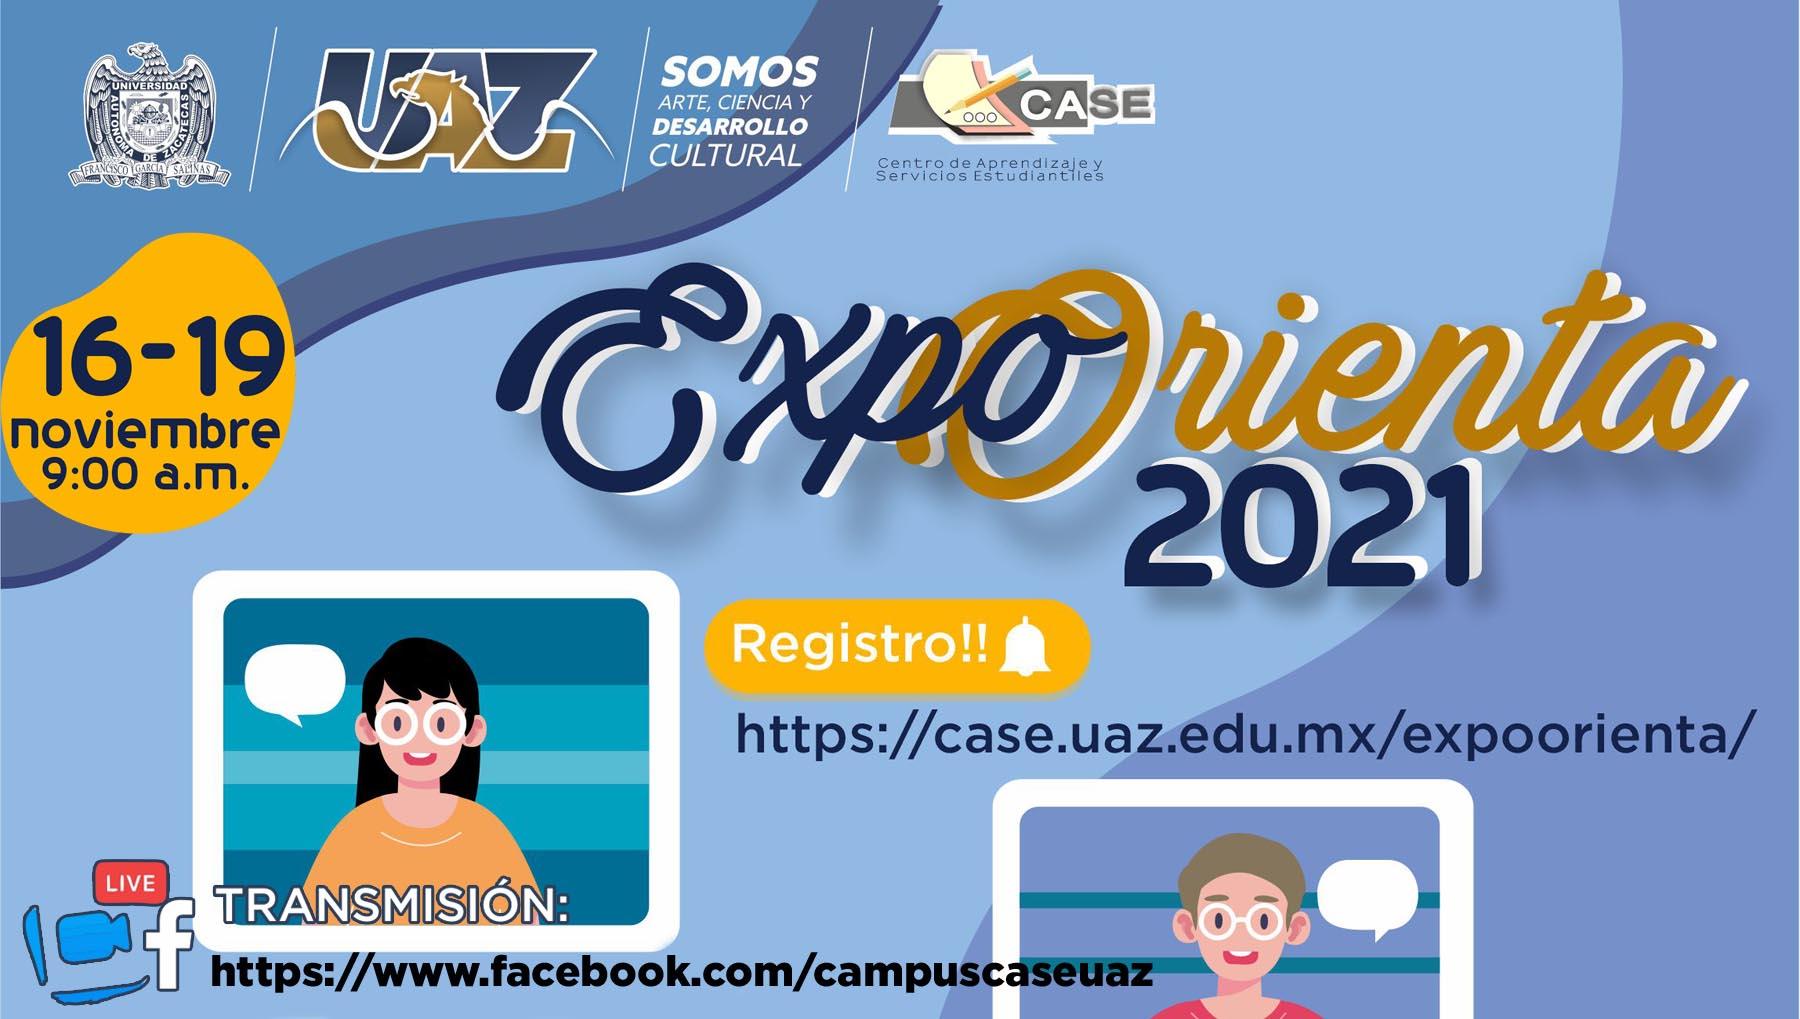 Expo Orienta 2021